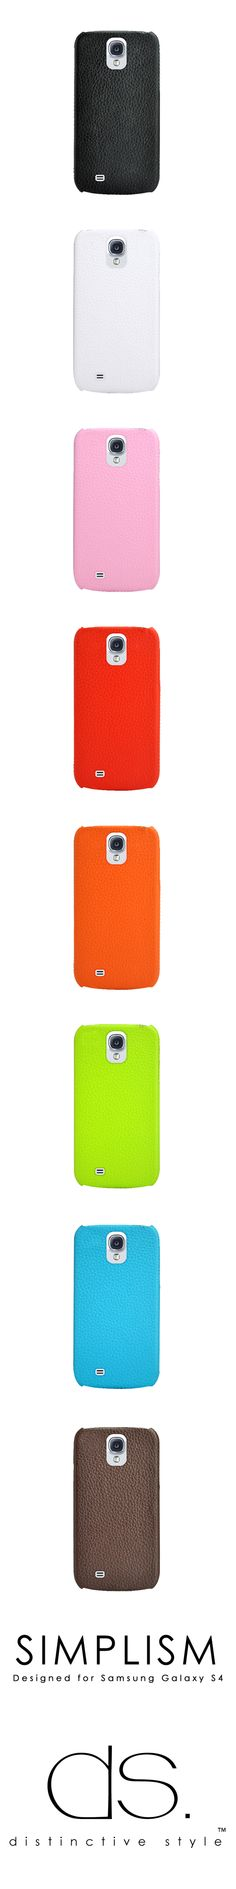 Simplism Series Samsung Galaxy S4 Leather Cases i9500 (Pre-Order) http://www.dsstyles.com/samsung-galaxy-s4-cases/simplism-series.html